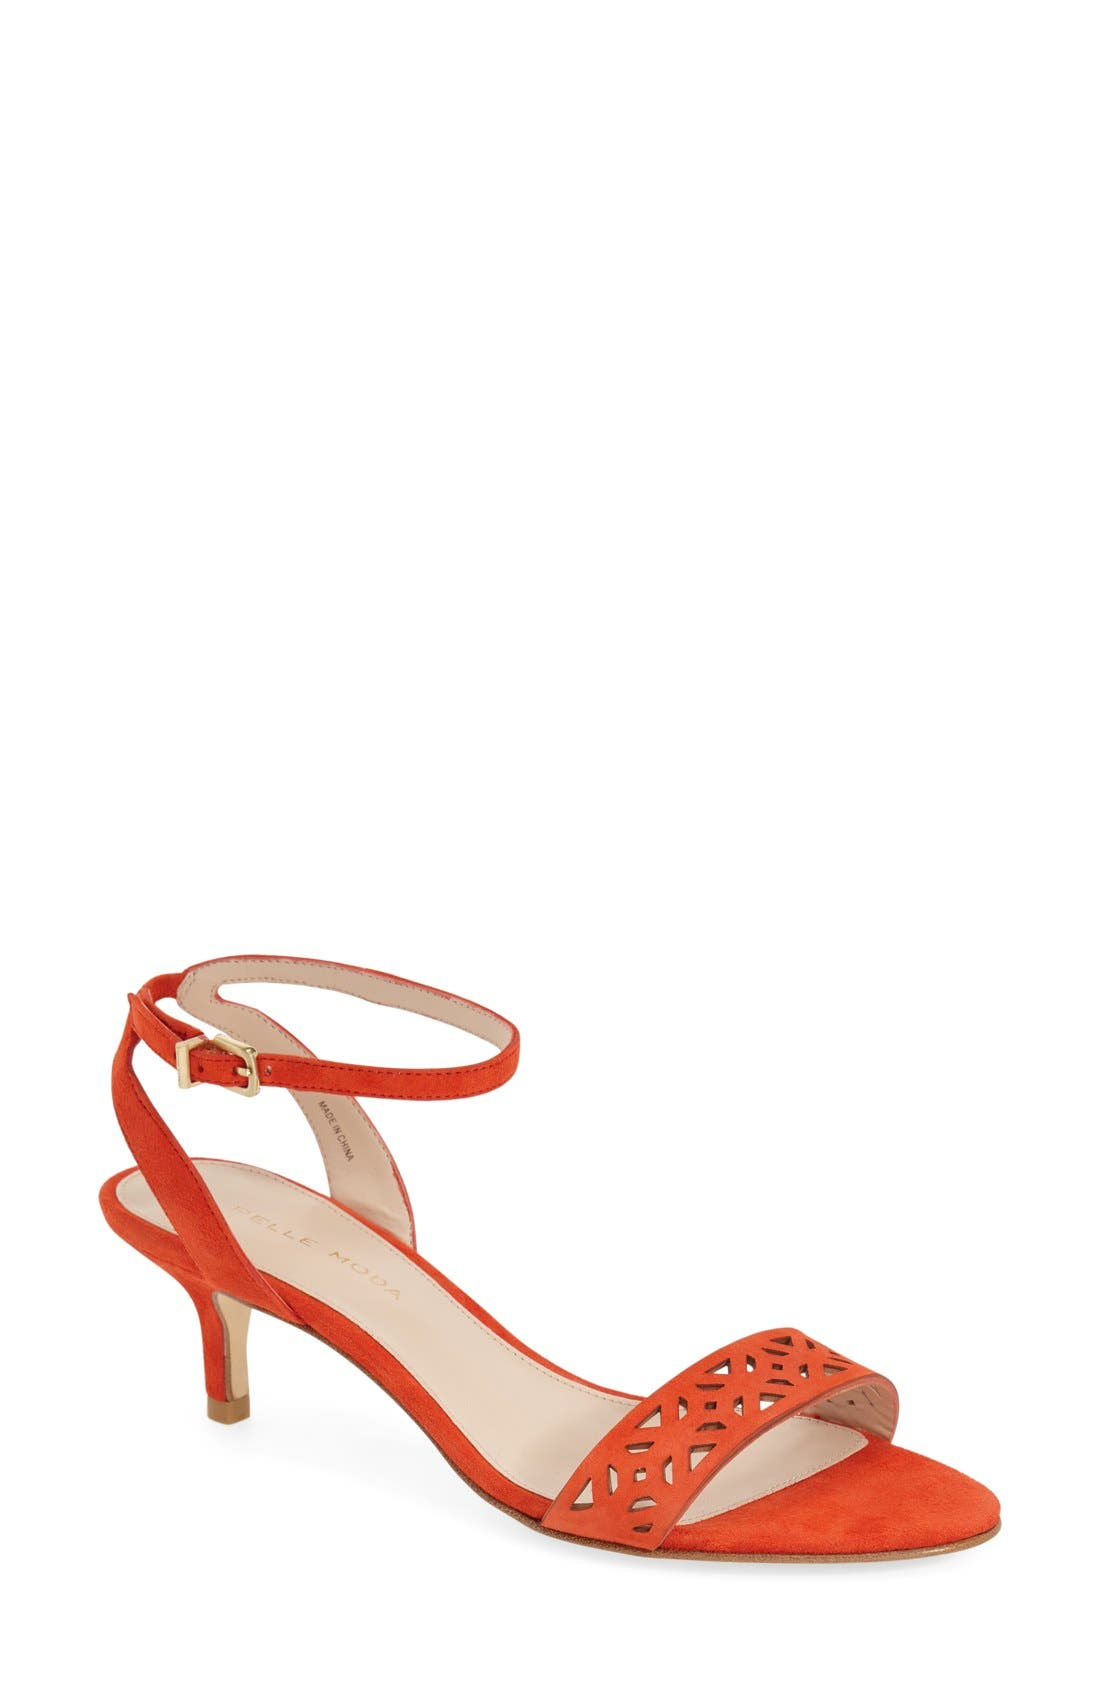 'Otis' Ankle Strap Sandal,                             Main thumbnail 7, color,